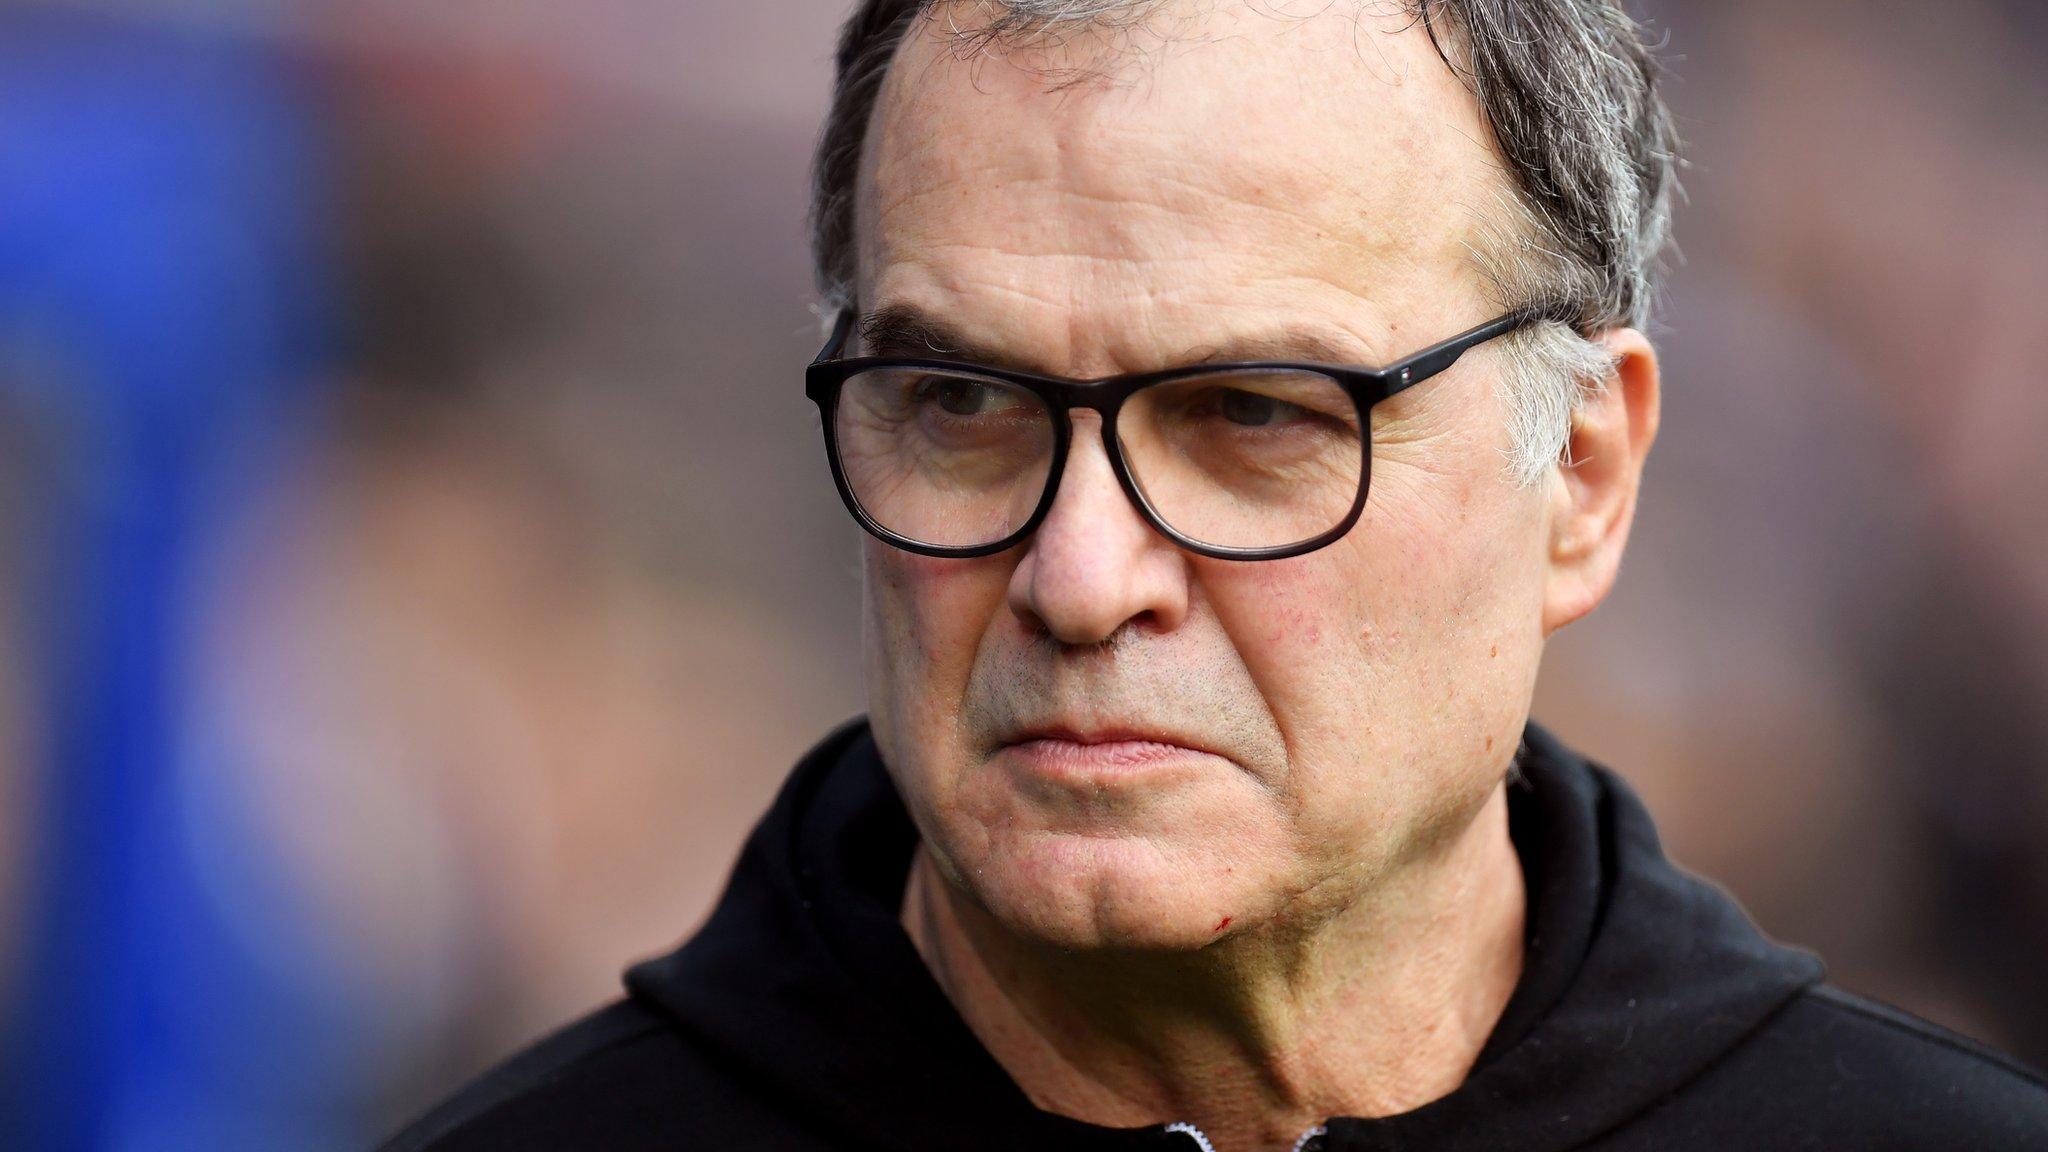 Leeds United v Derby County 'spy' row: EFL investigates Whites over incident